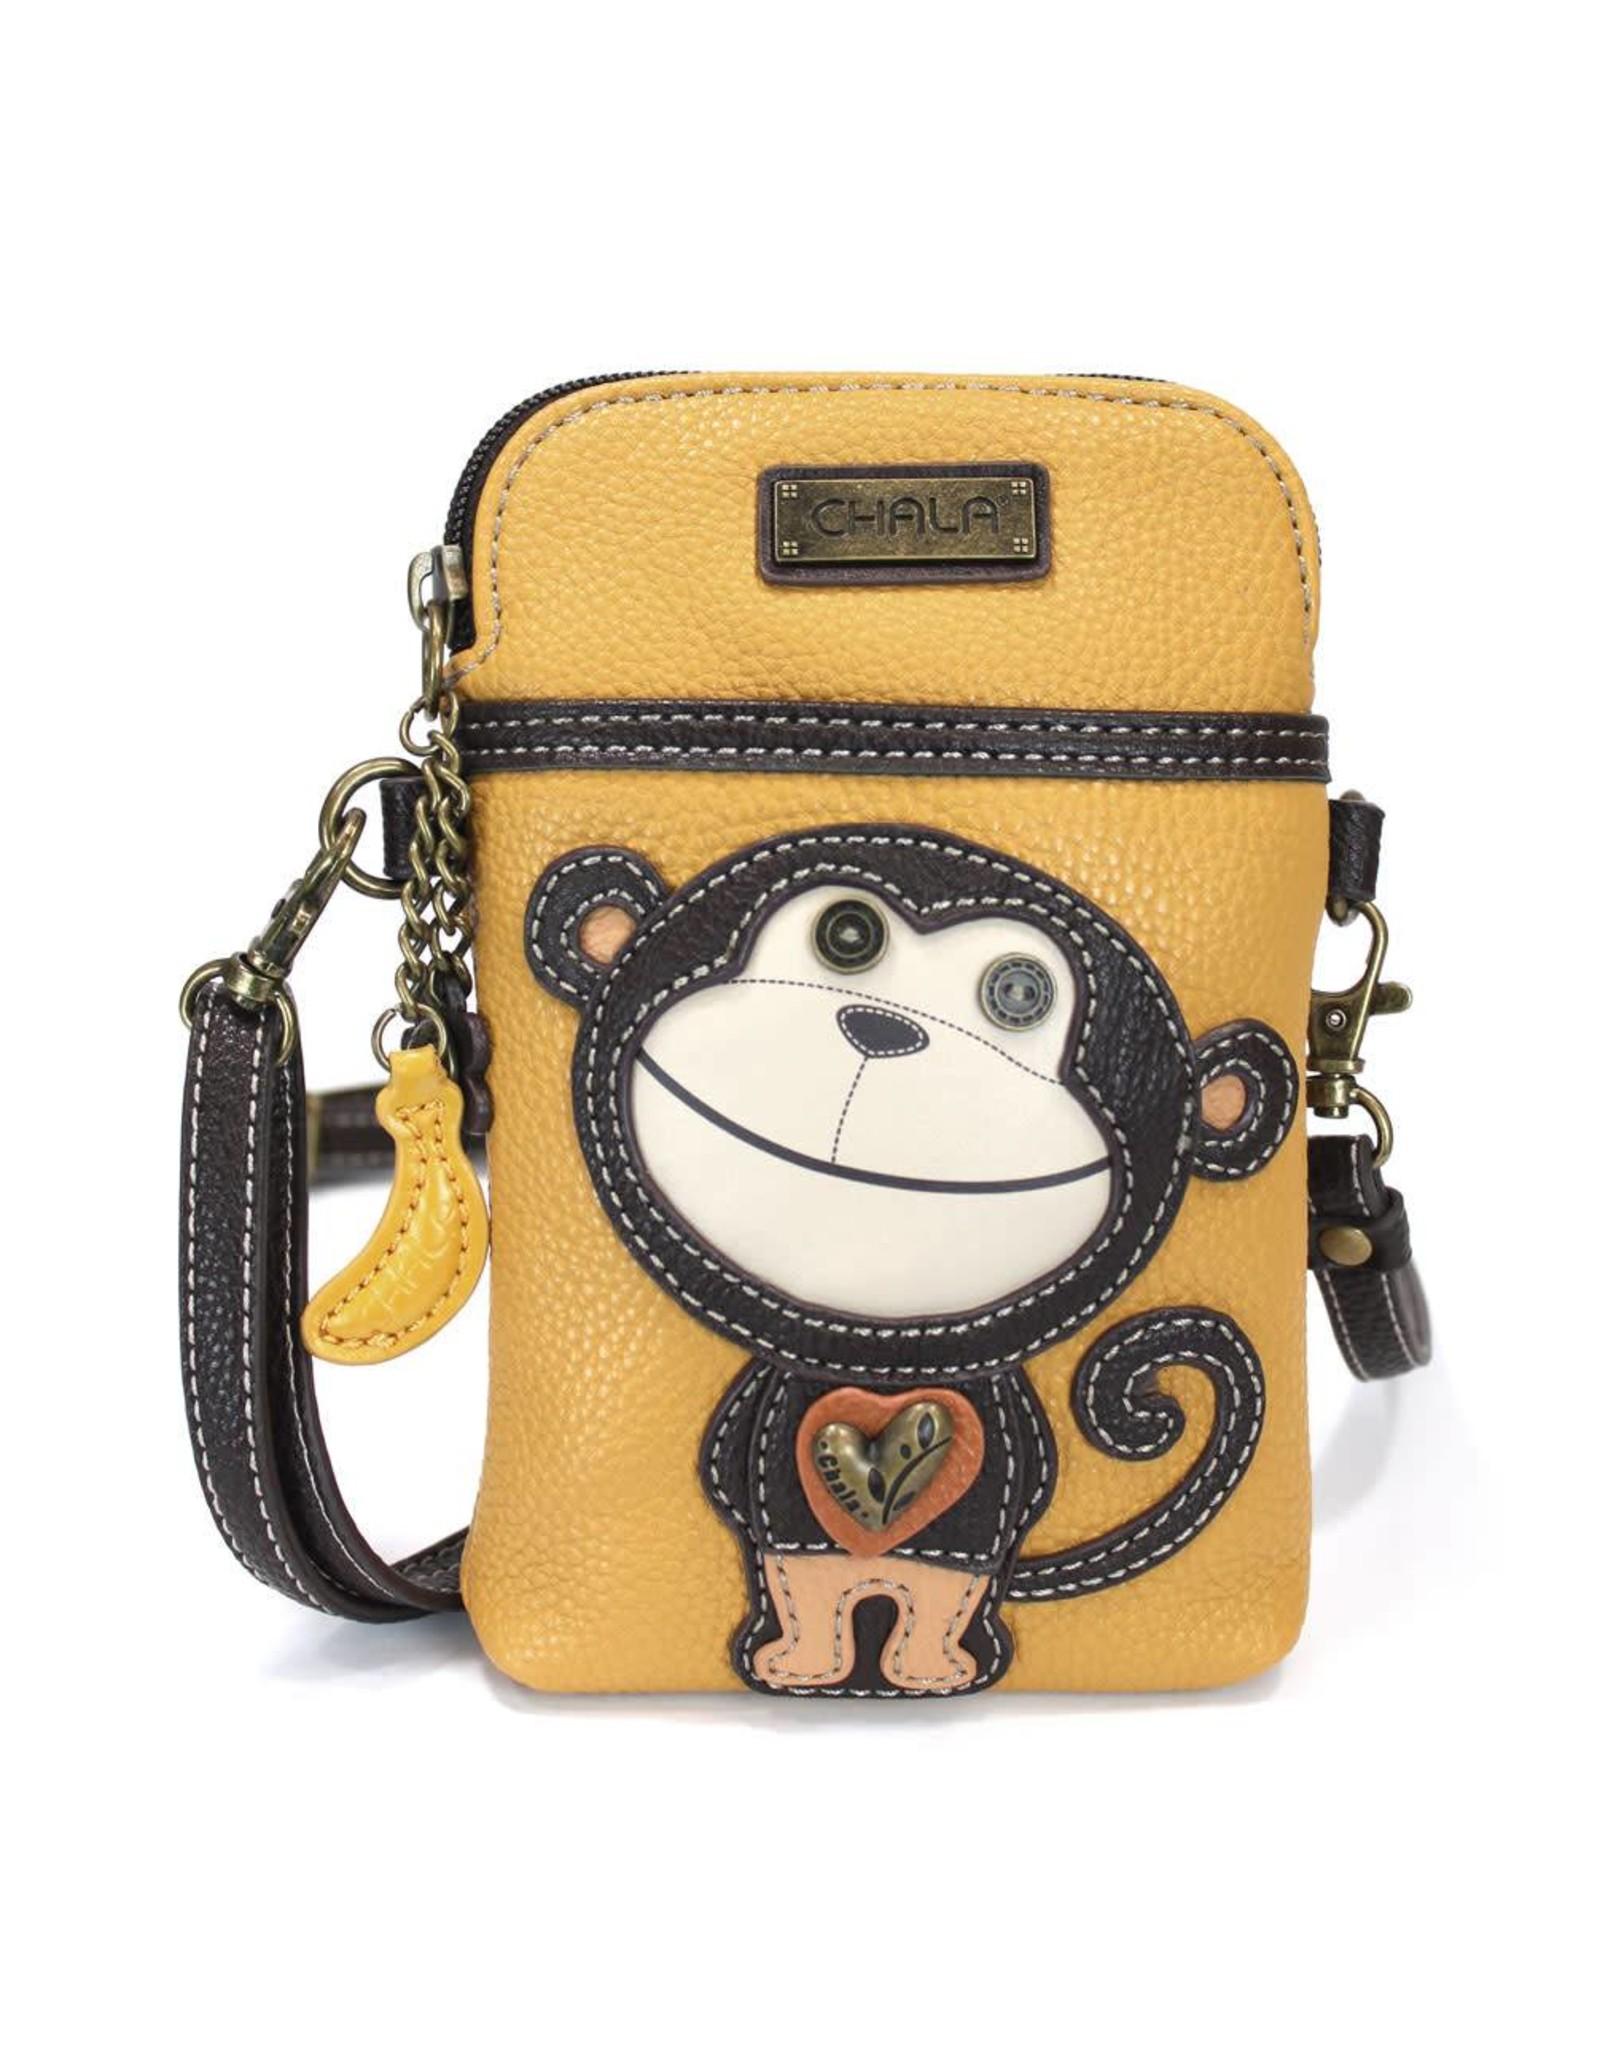 Chala Cell Phone Crossbody Smartie Monkey